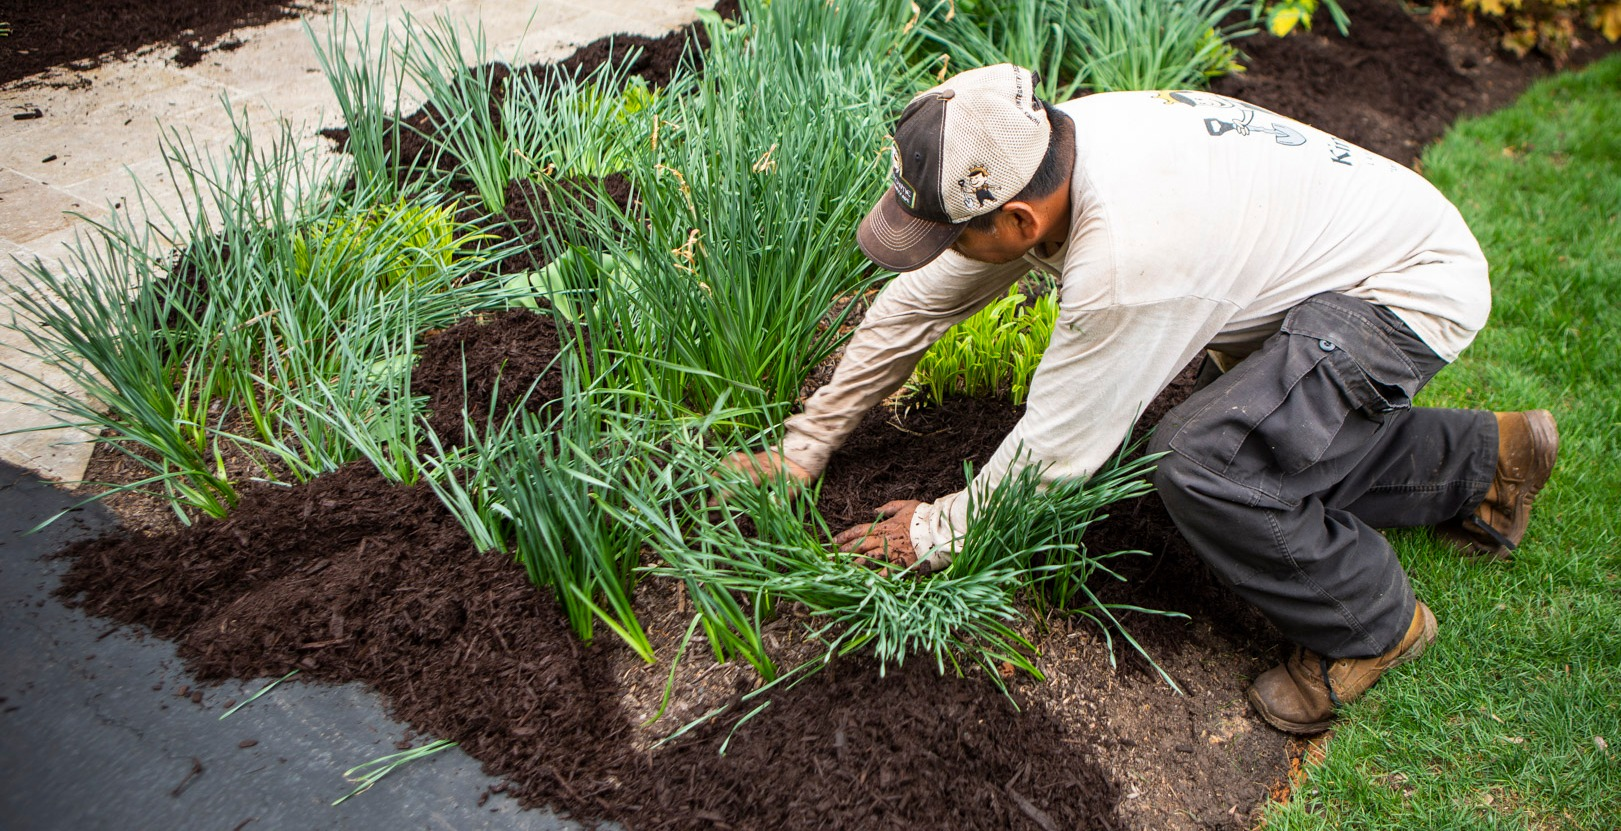 landscape professional planting new plants